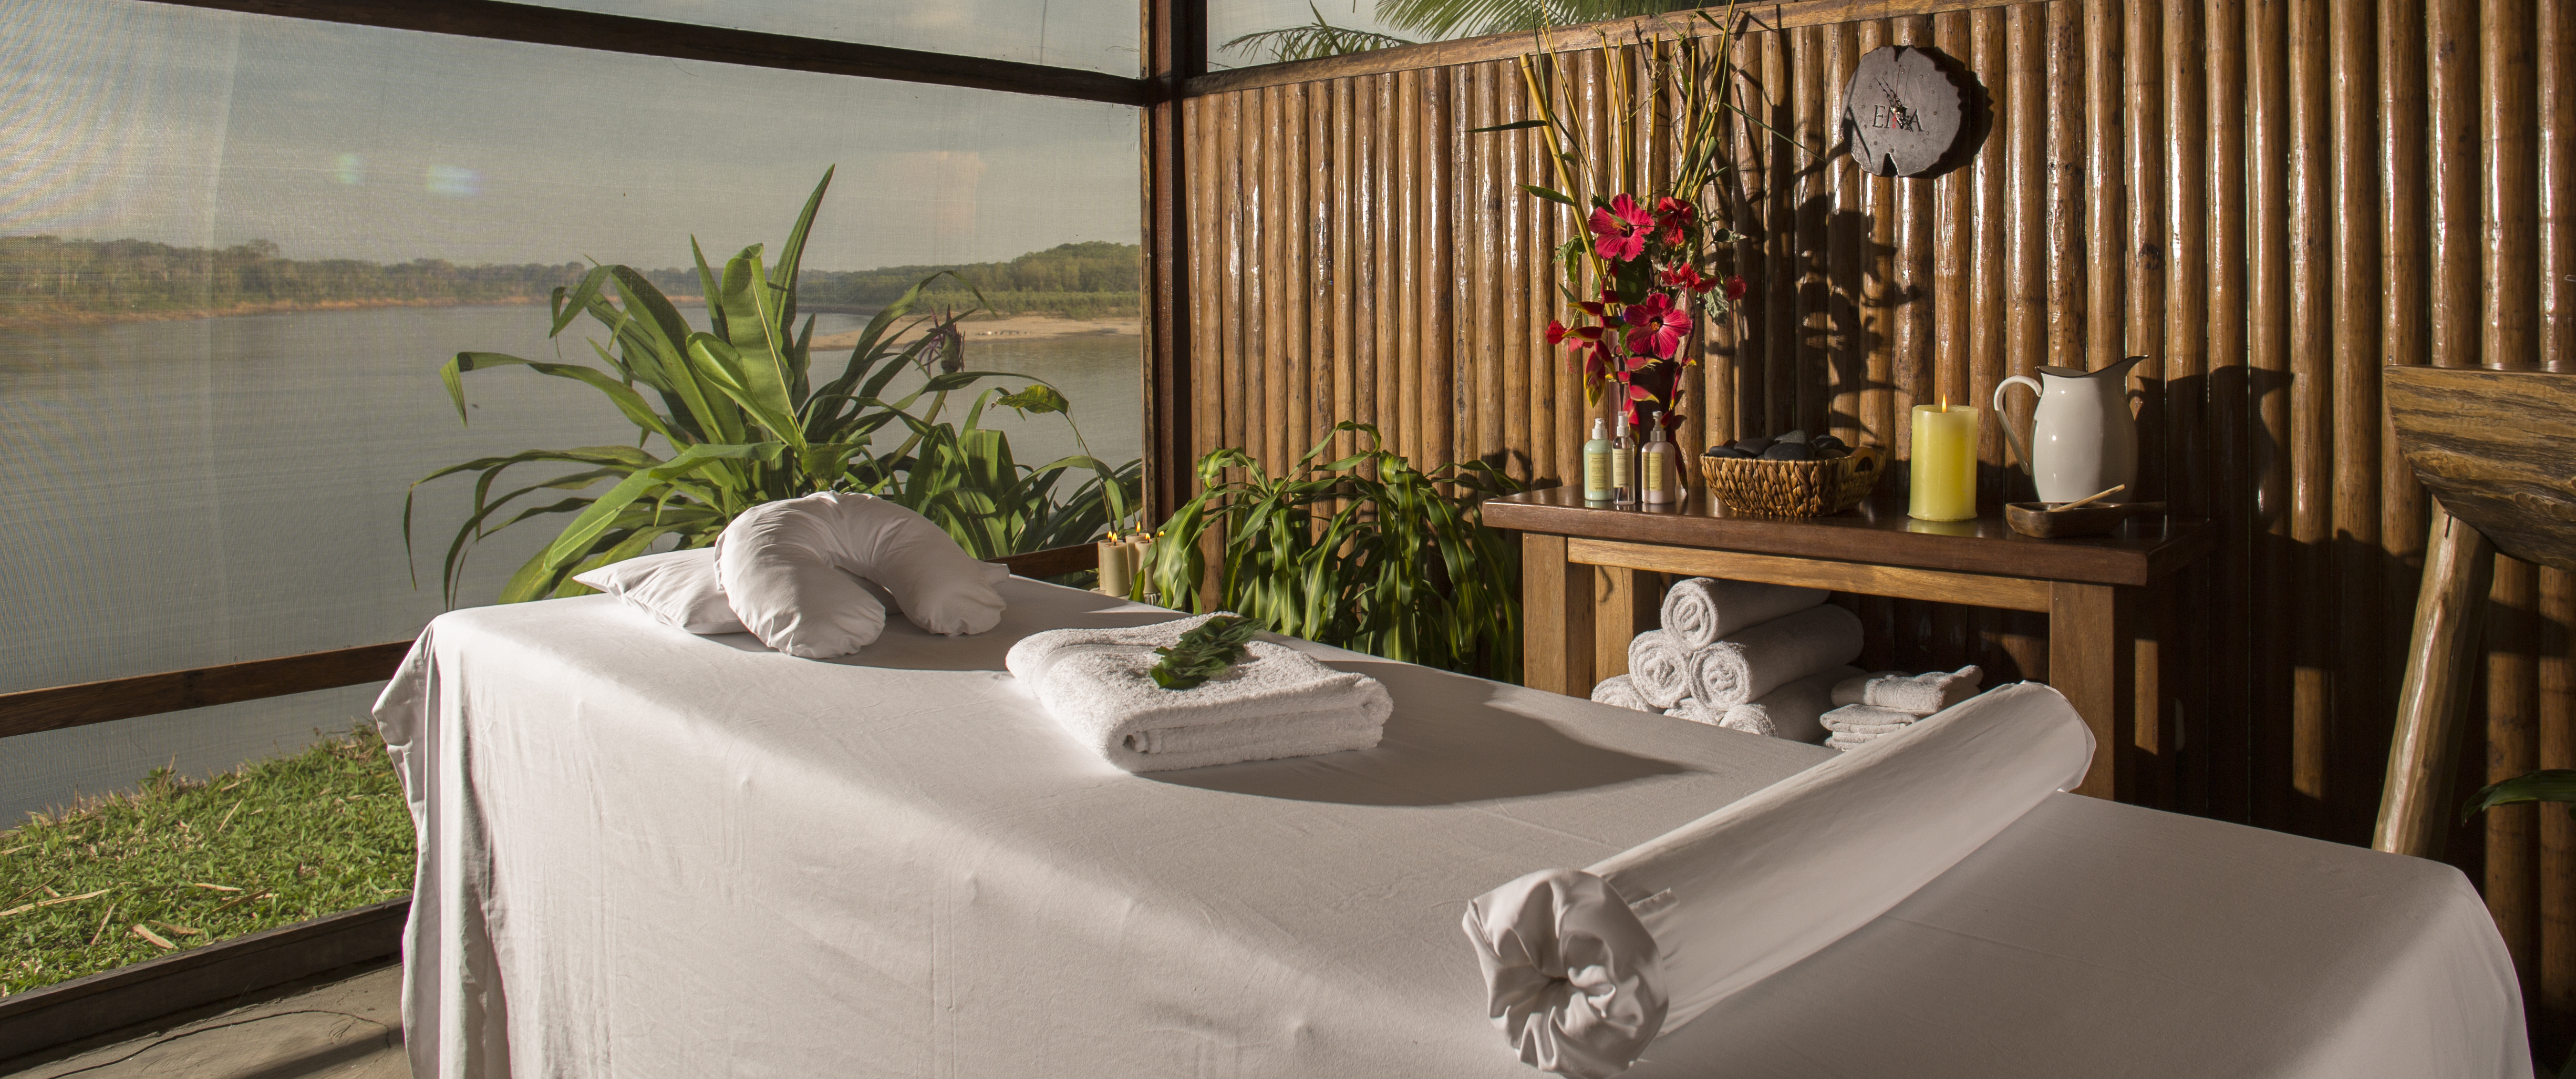 reserva-amazonica-spa